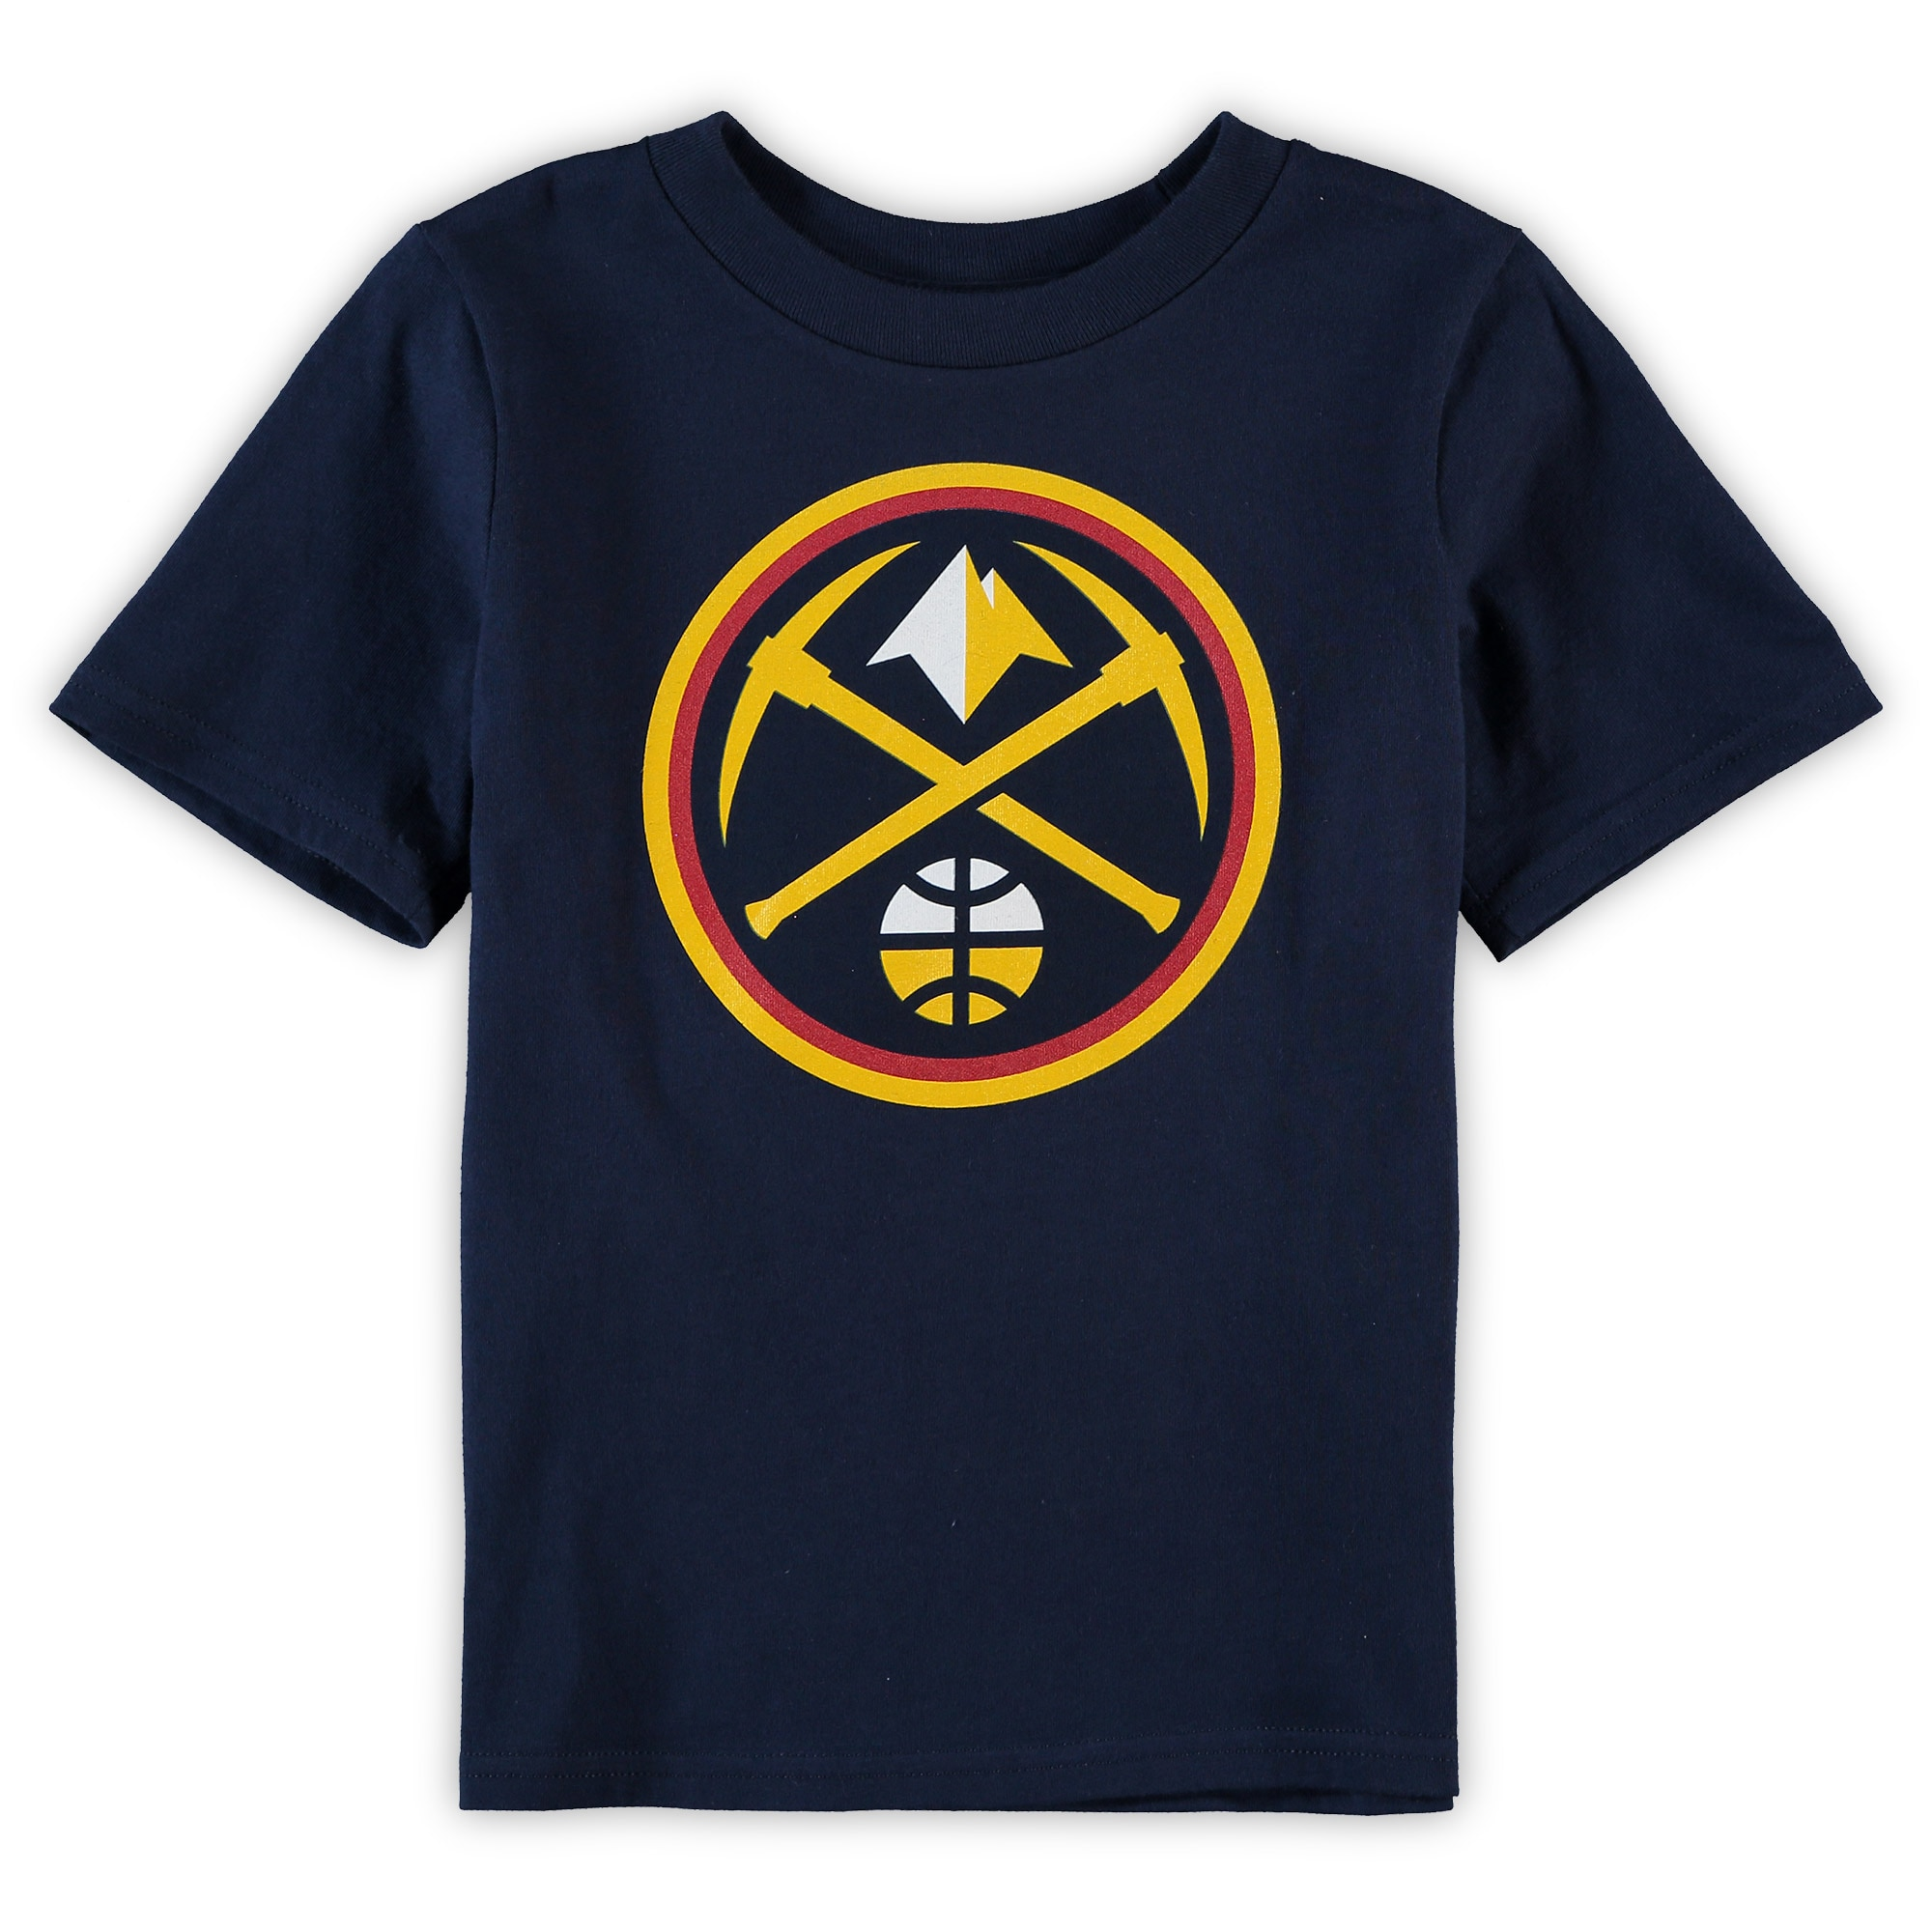 Denver Nuggets Toddler Primary Logo T-Shirt - Navy